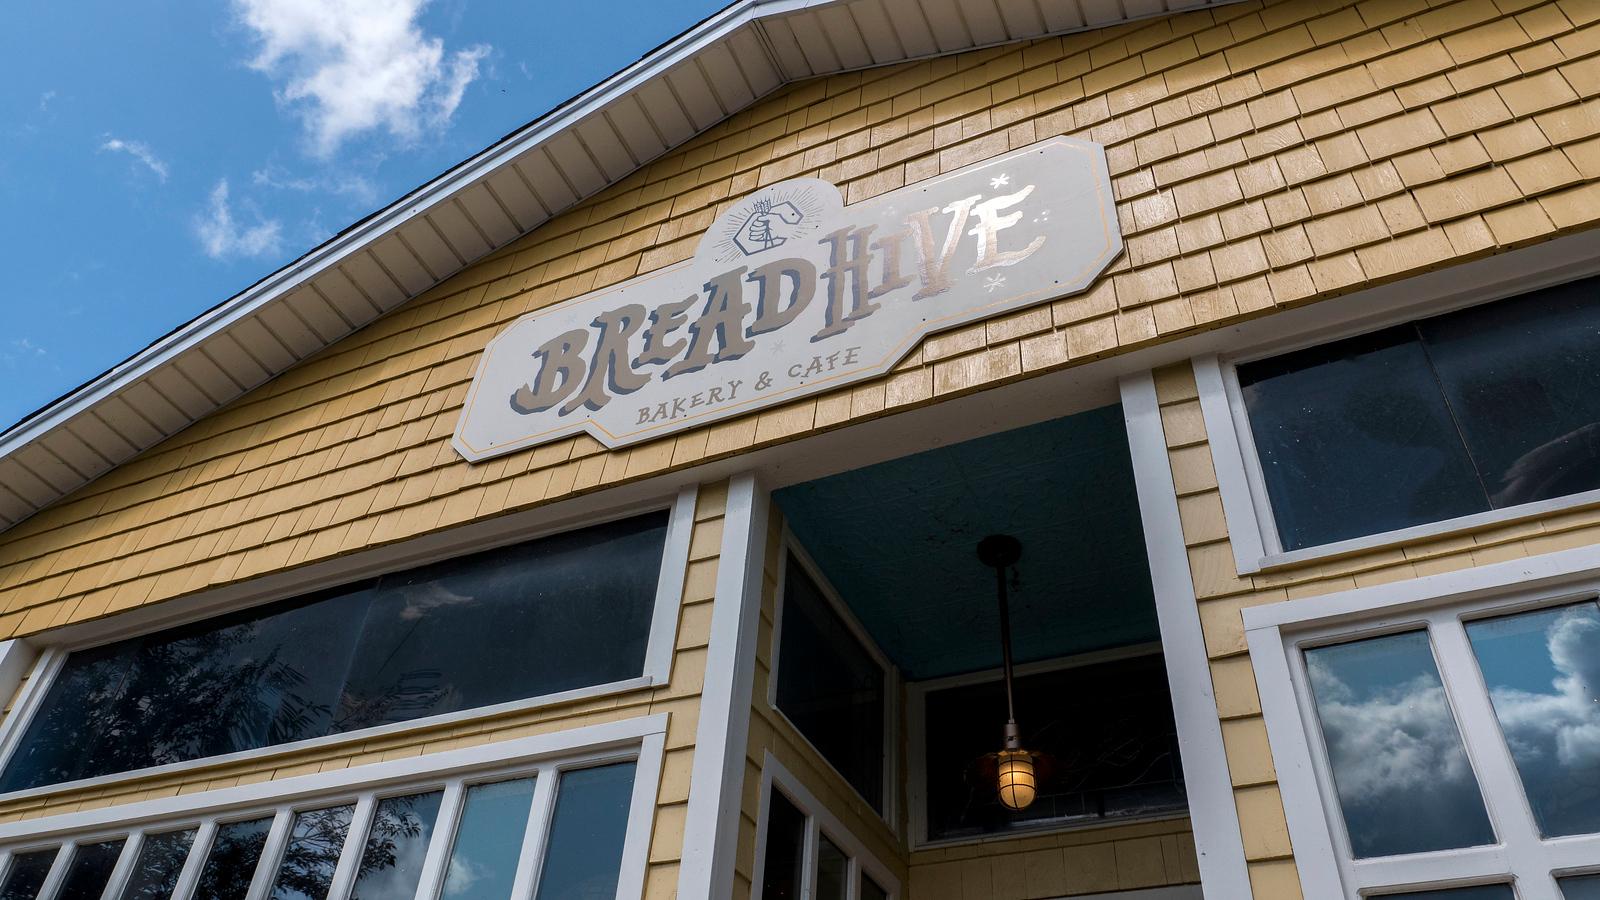 Breadhive Bakery & Cafe